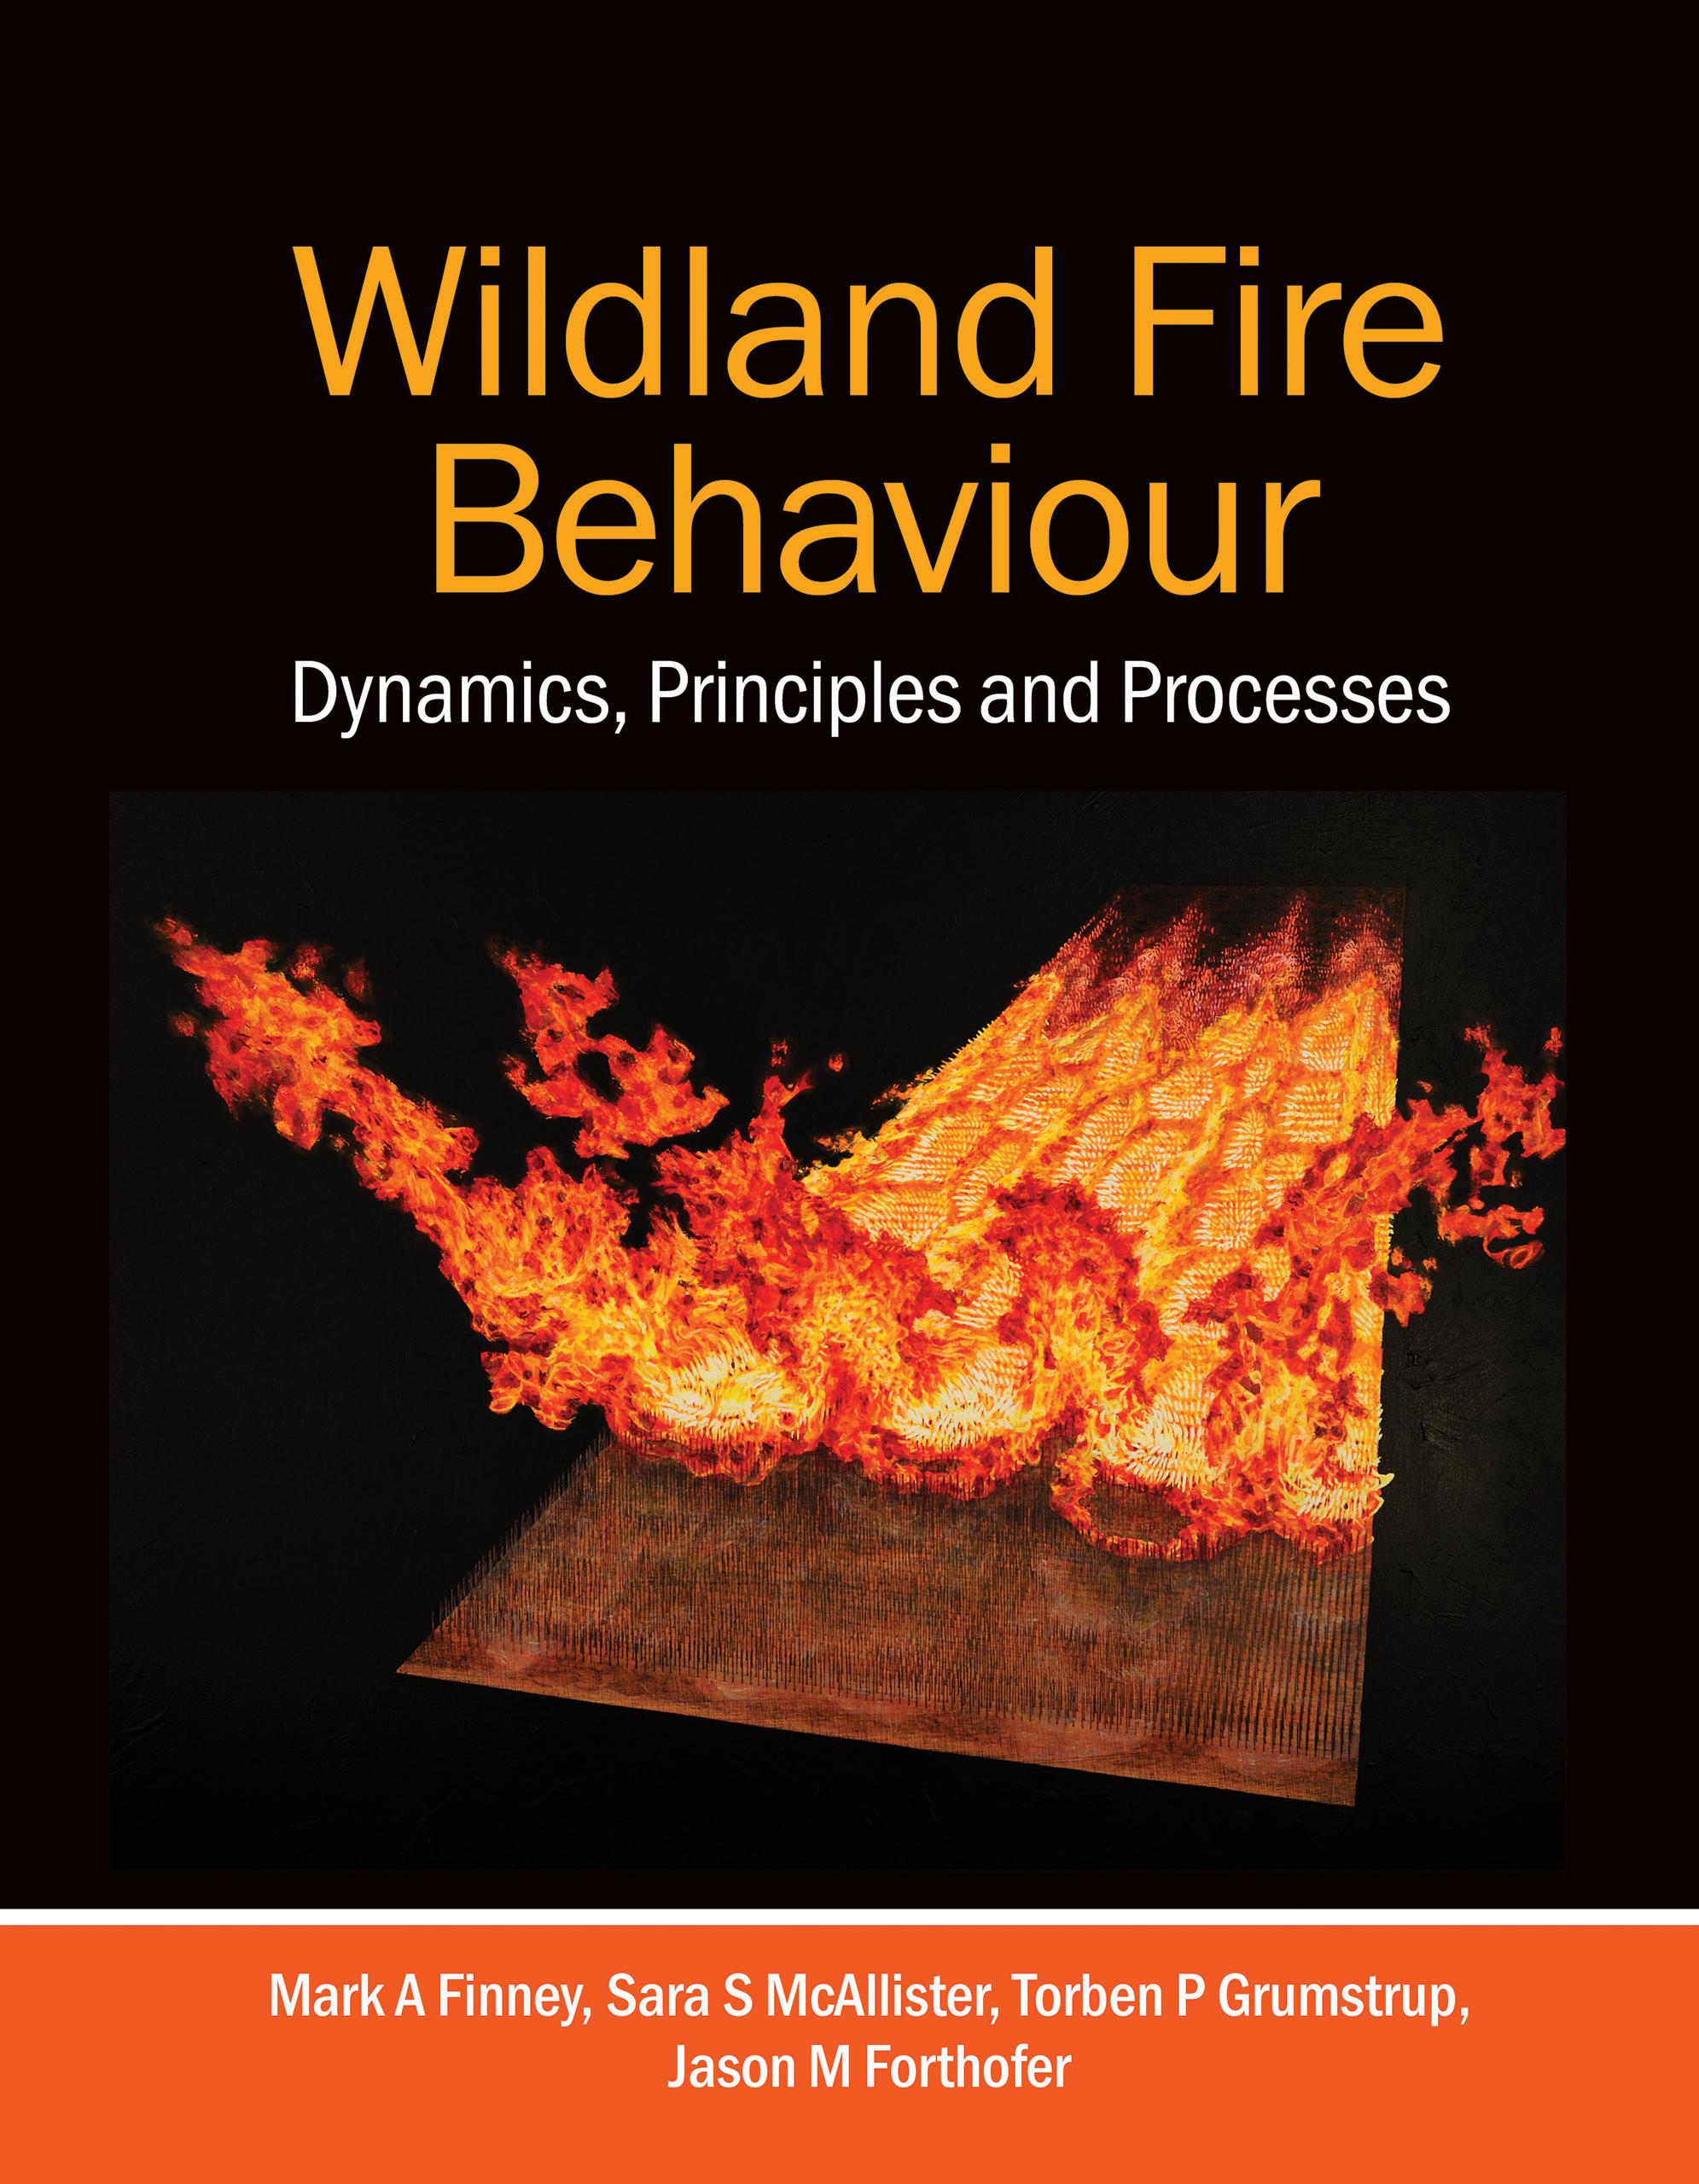 Wildland Fire Behaviour: Dynamics, Principles and Processes